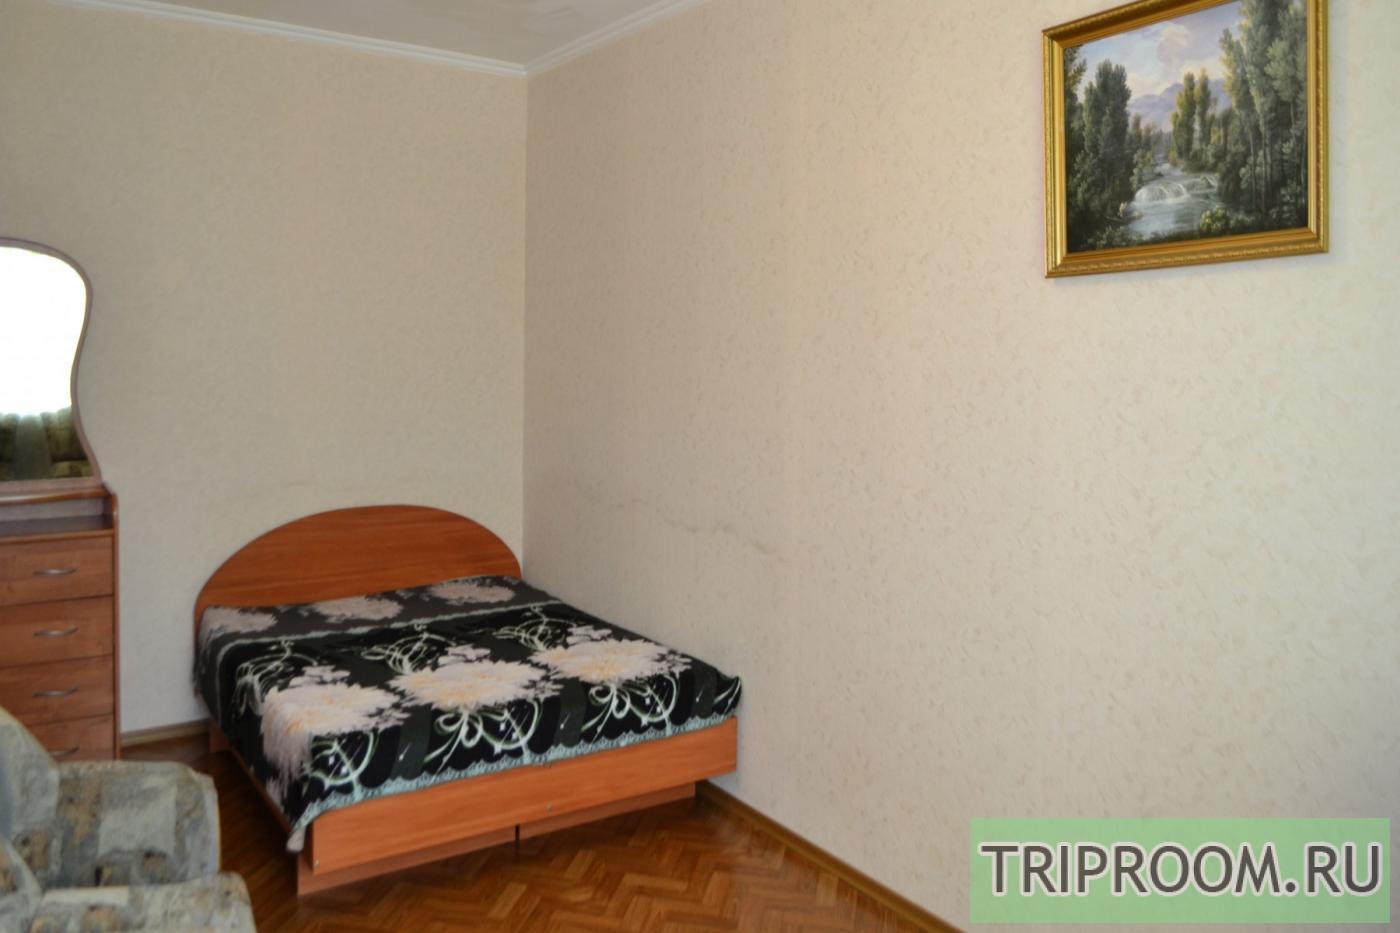 1-комнатная квартира посуточно (вариант № 12444), ул. Рихарда Зорге улица, фото № 2